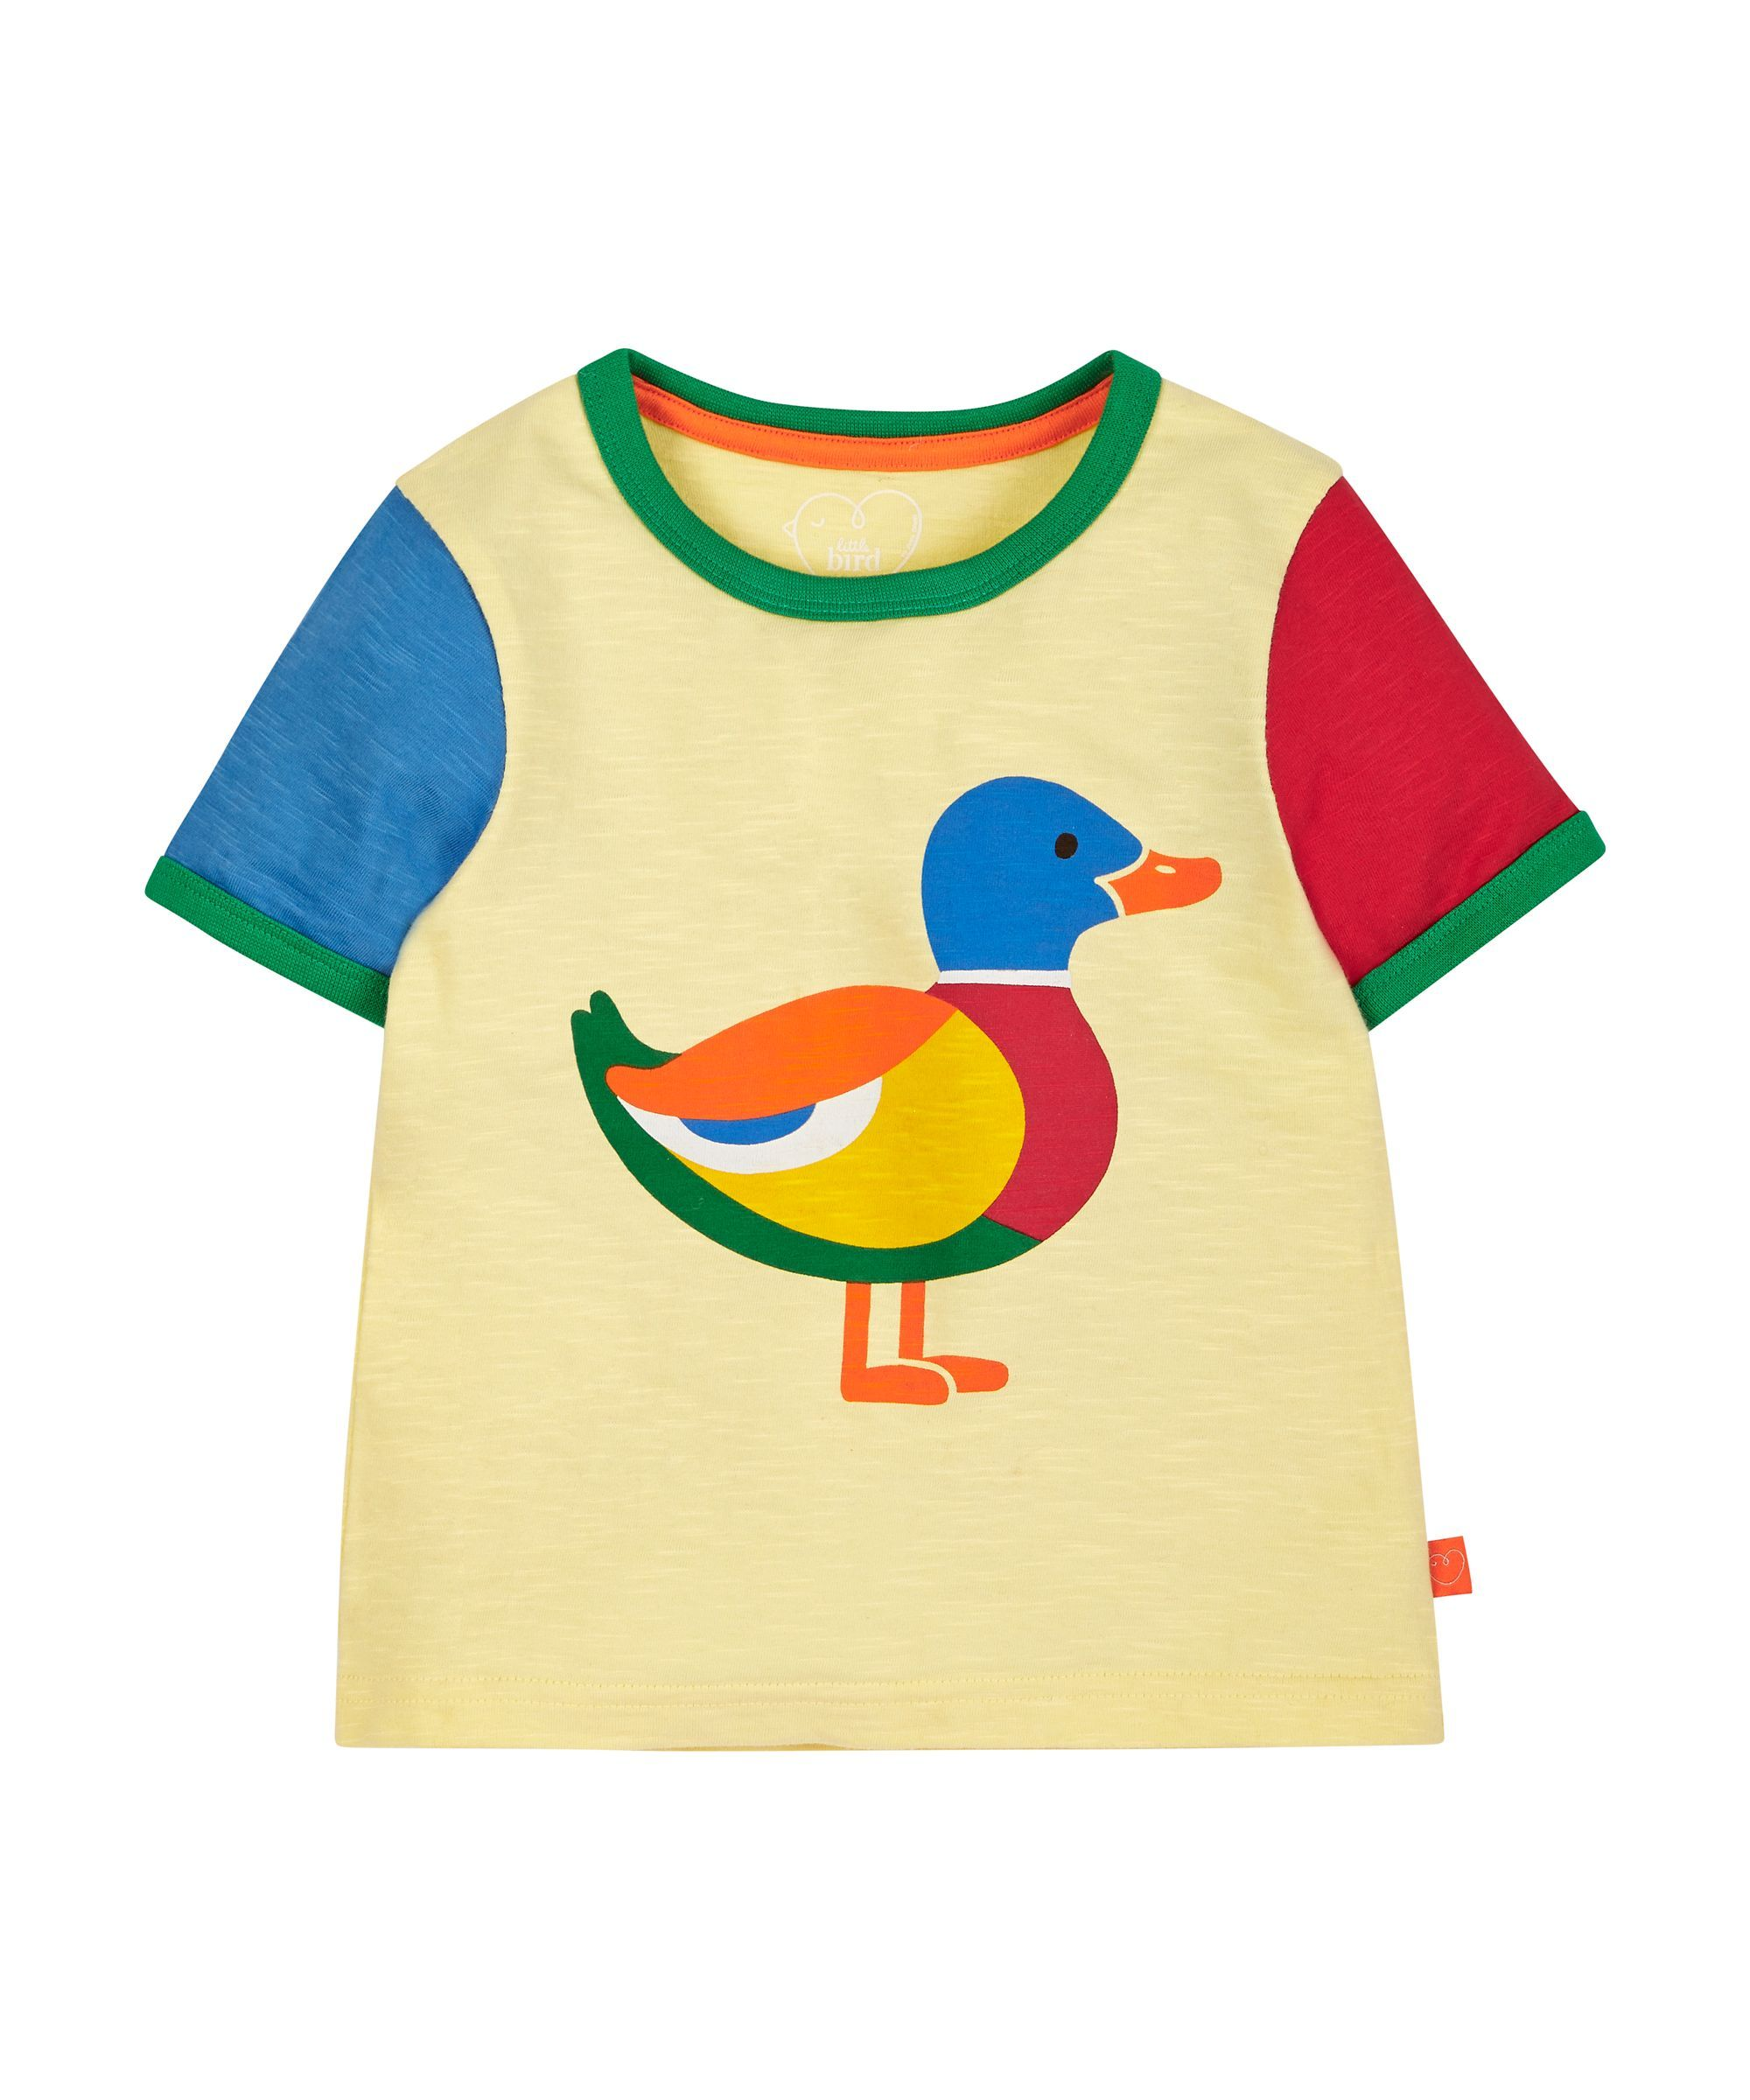 ee8704c9c1f1 Little Bird by Jools Duck T-Shirt   daily routines   Little bird ...